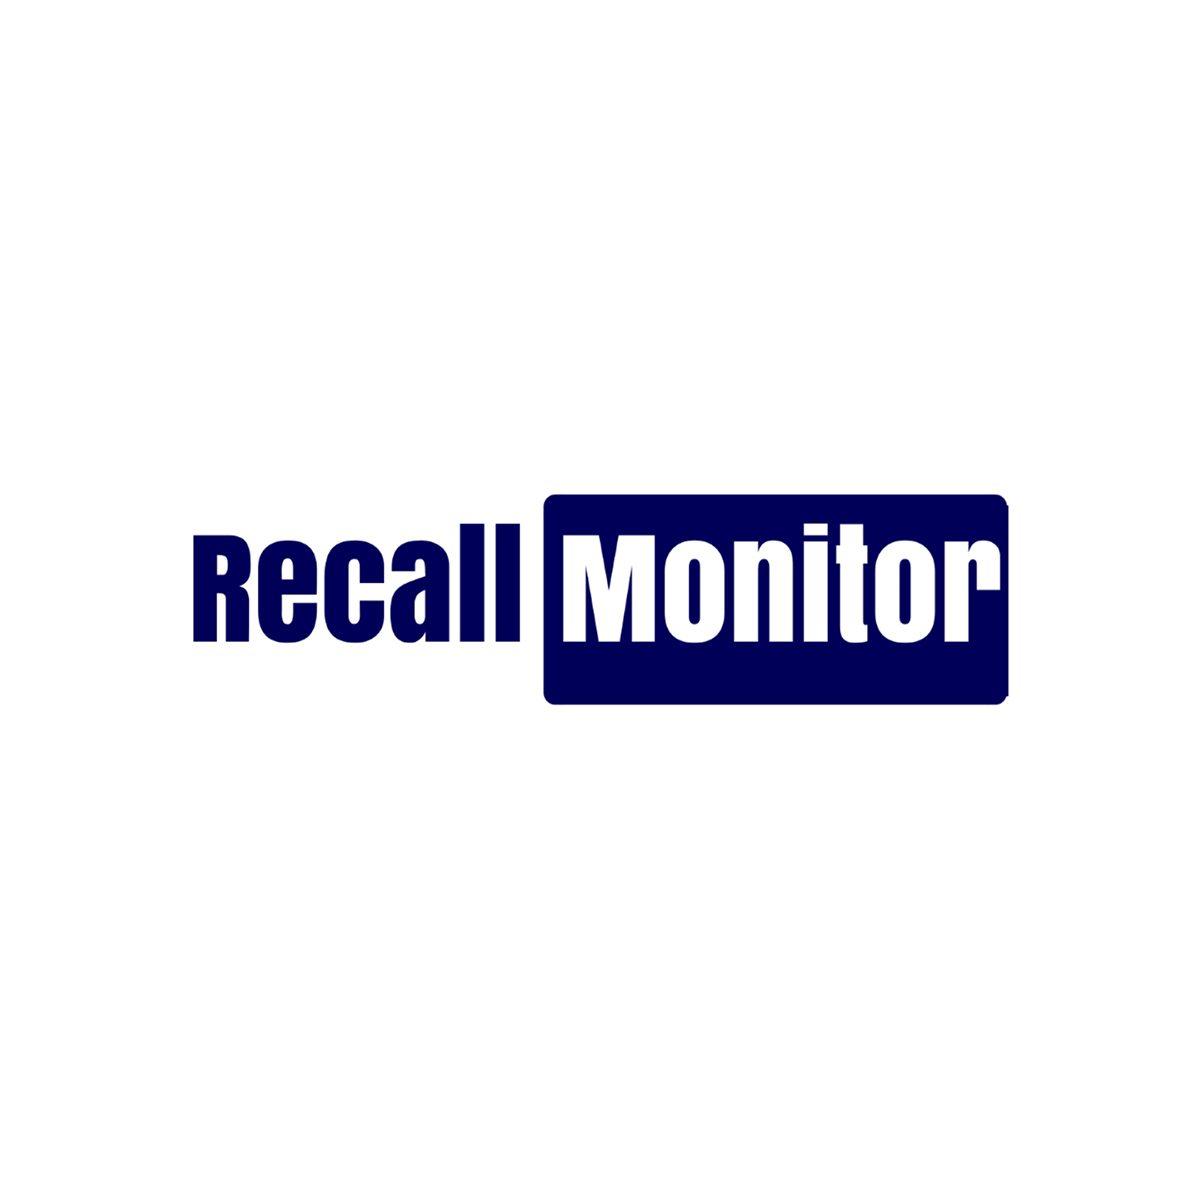 Recall Monitor Logo